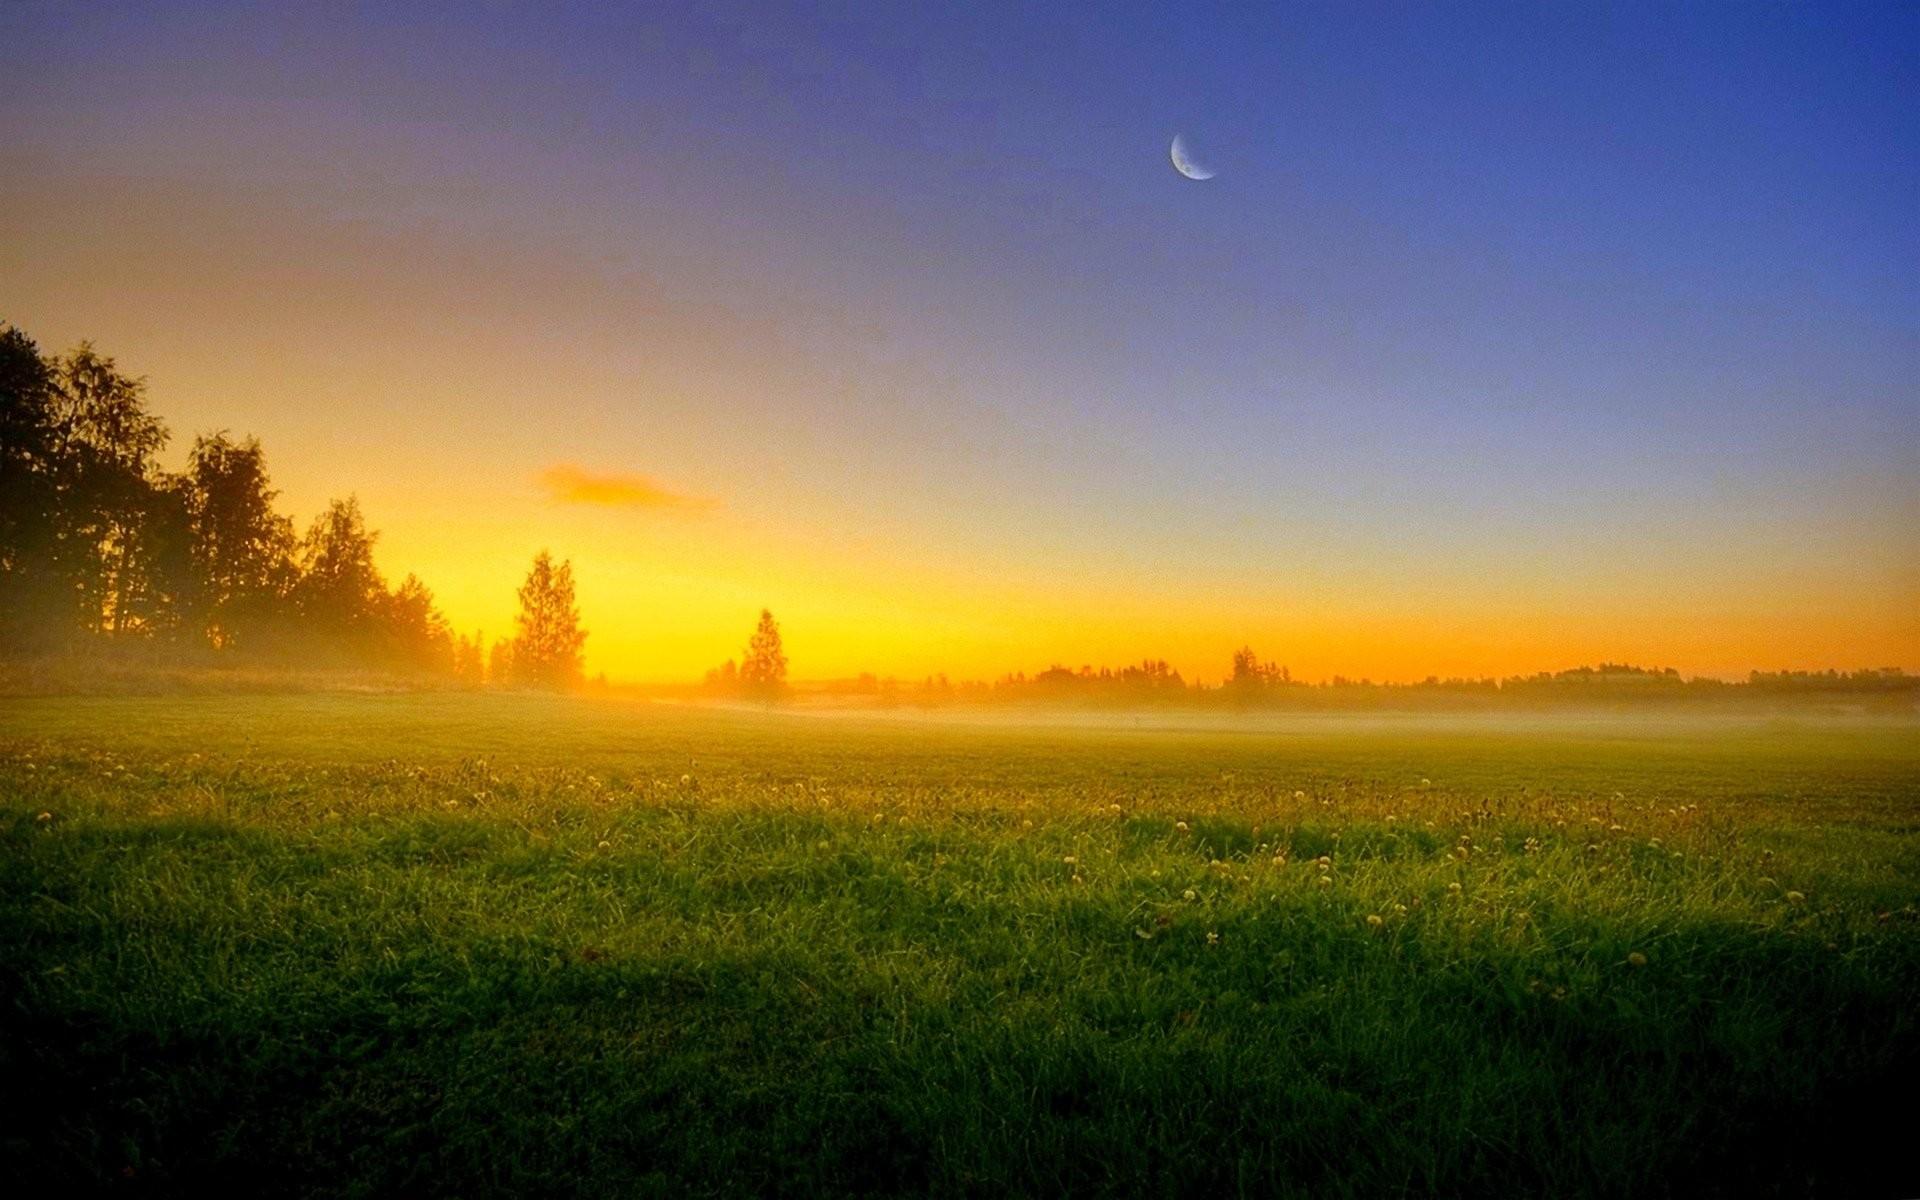 Sunrise Sunset: Grass Sunset Sky Night Landscape Nature Moon Field ...